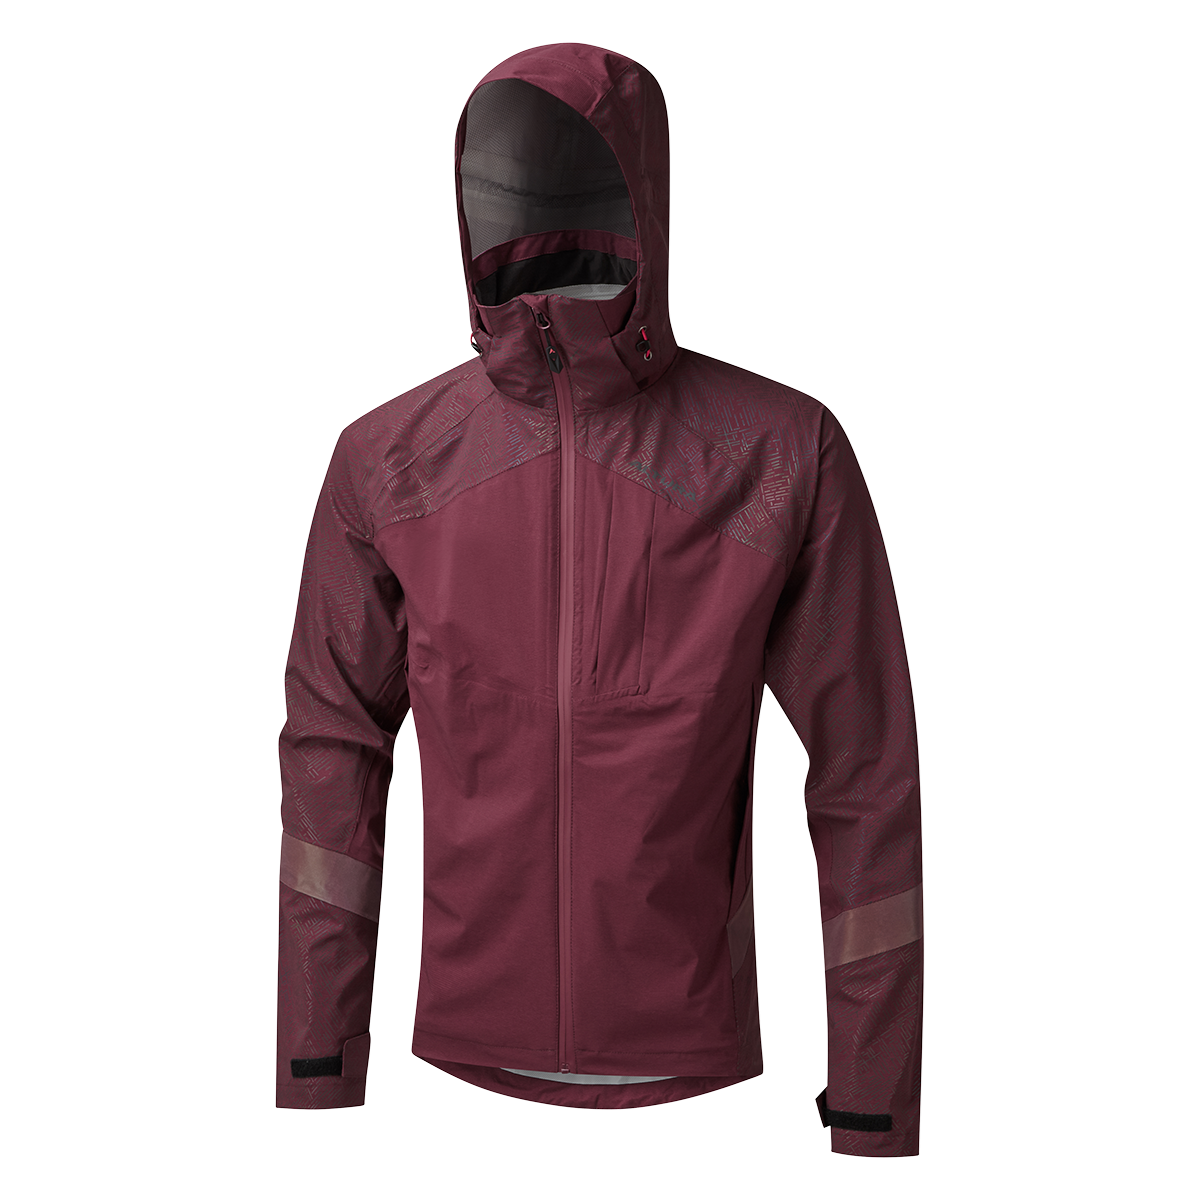 Nightvision Hurricane Waterproof Jacket